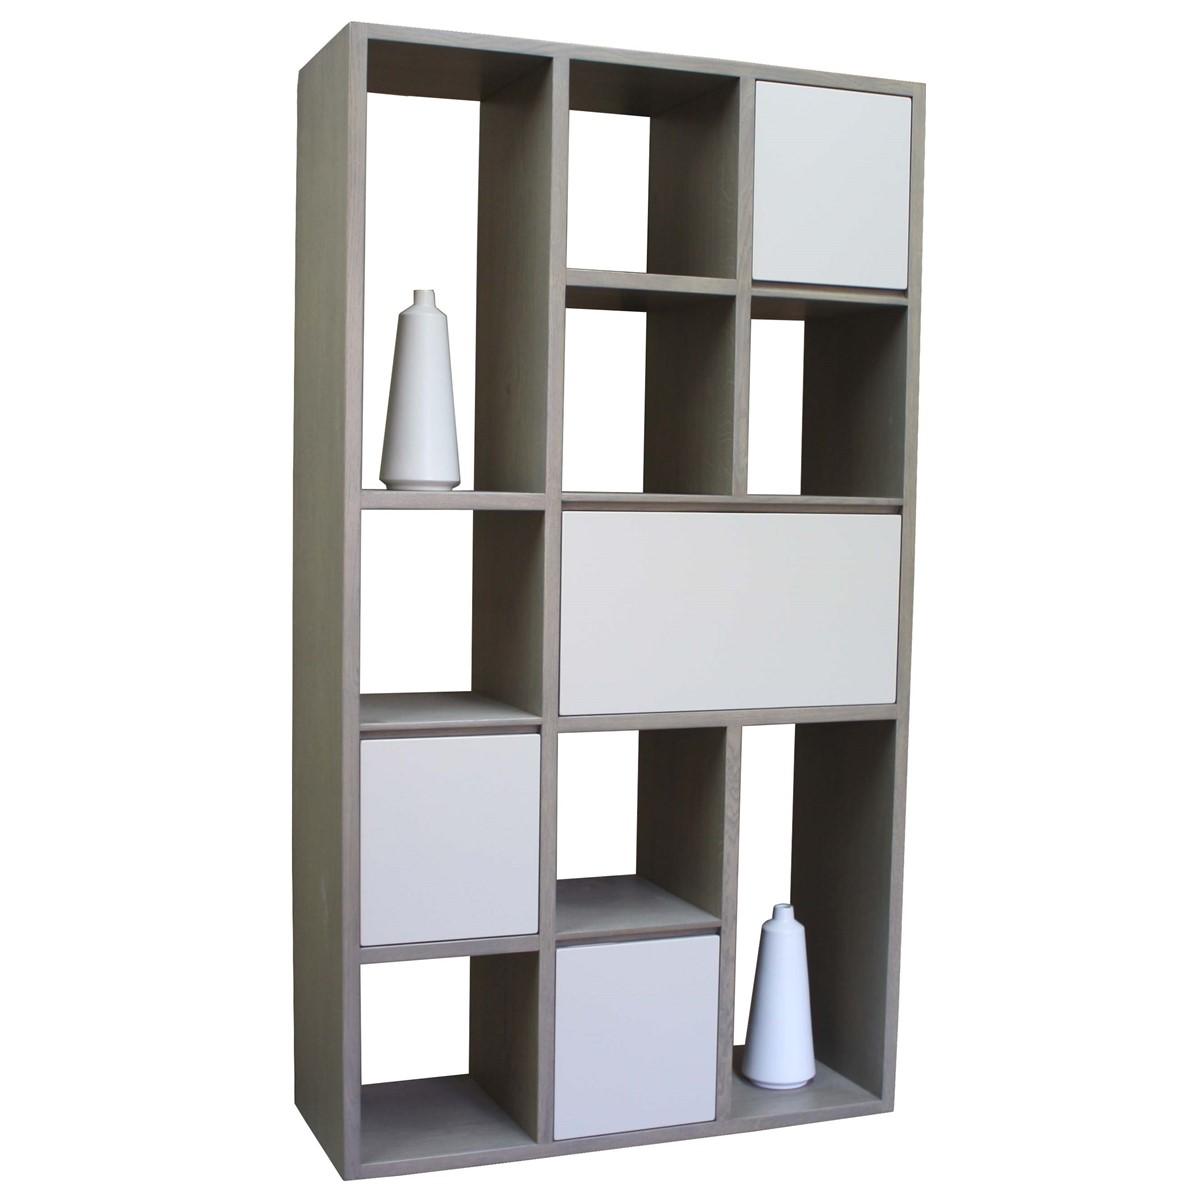 Biblioth que ch ne massif gris et laqu bleu blanc tourterelle pirotais - Bibliotheque laque blanc ...